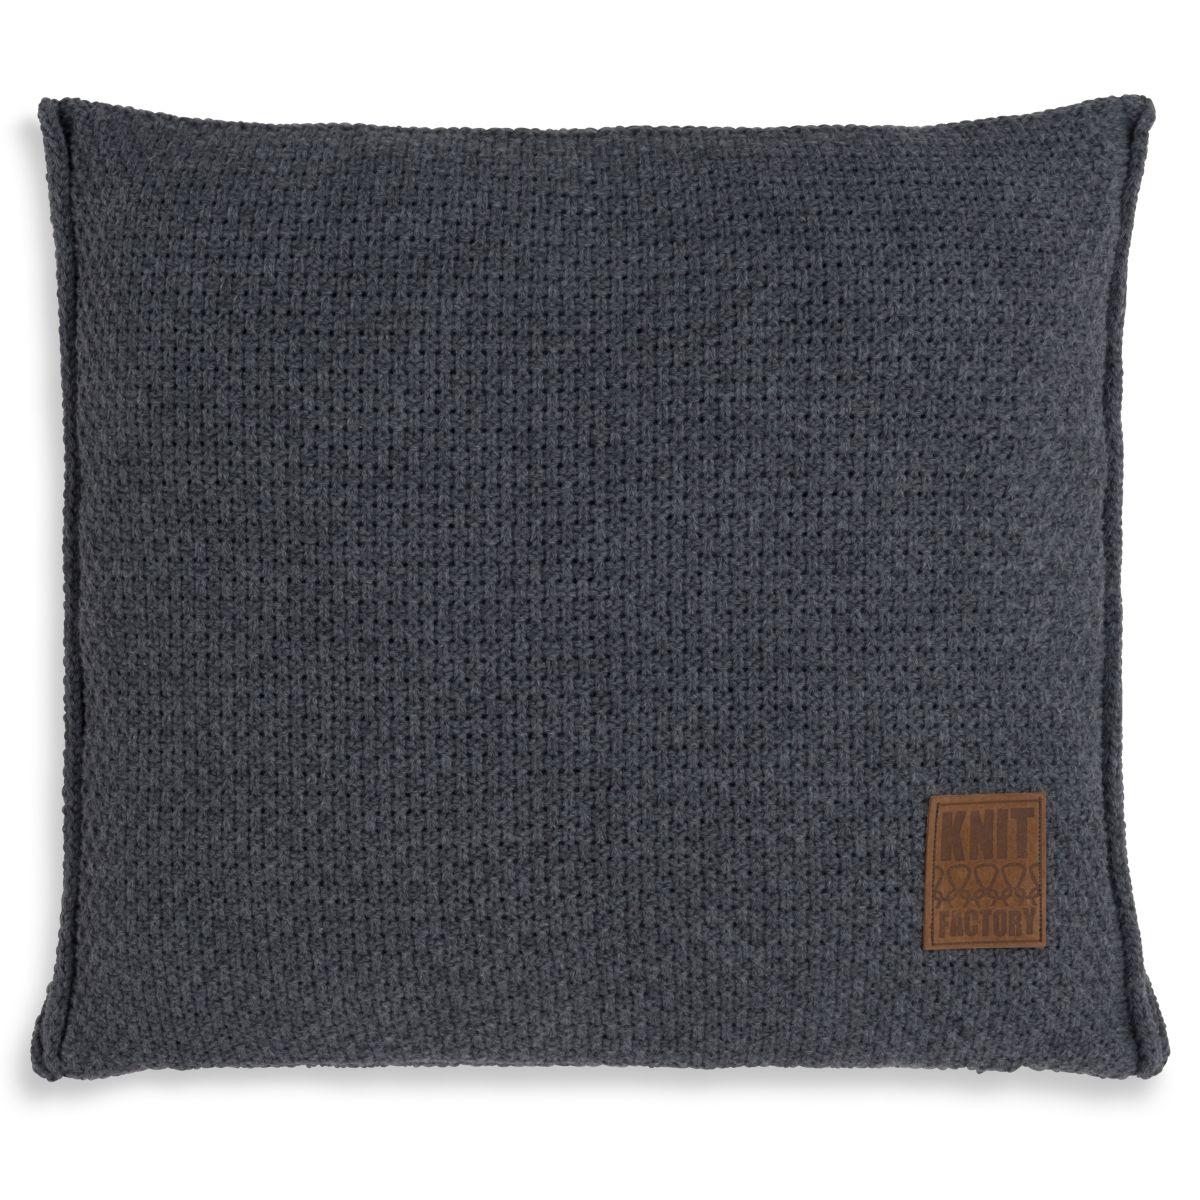 knit factory 1091210 kussen 50x50 jesse antraciet 1